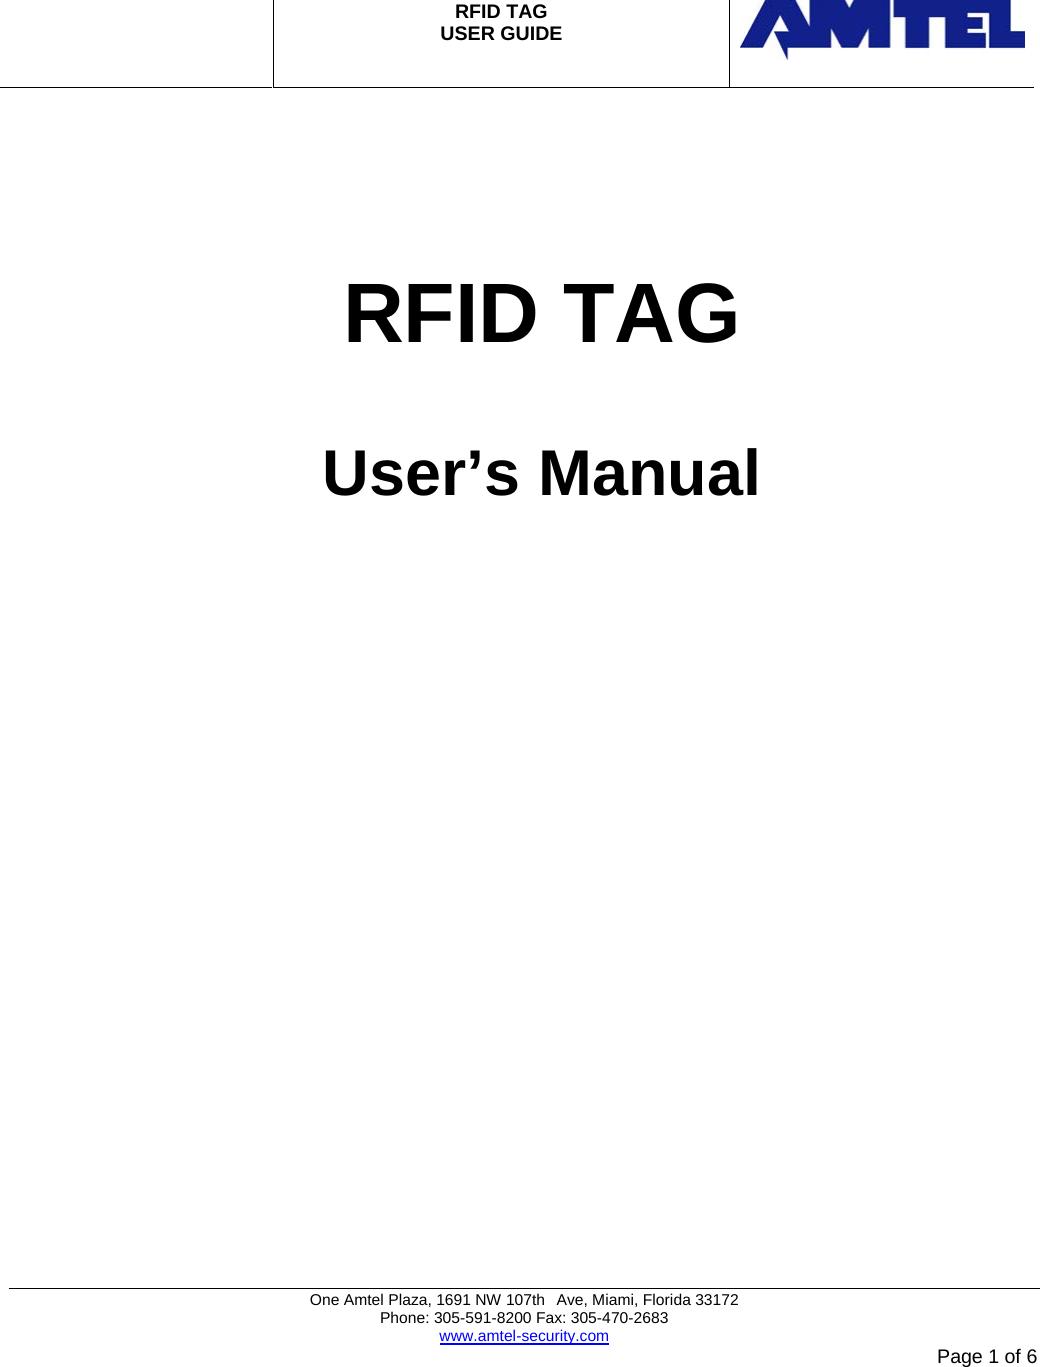 Solar System Rfi Manual Guide